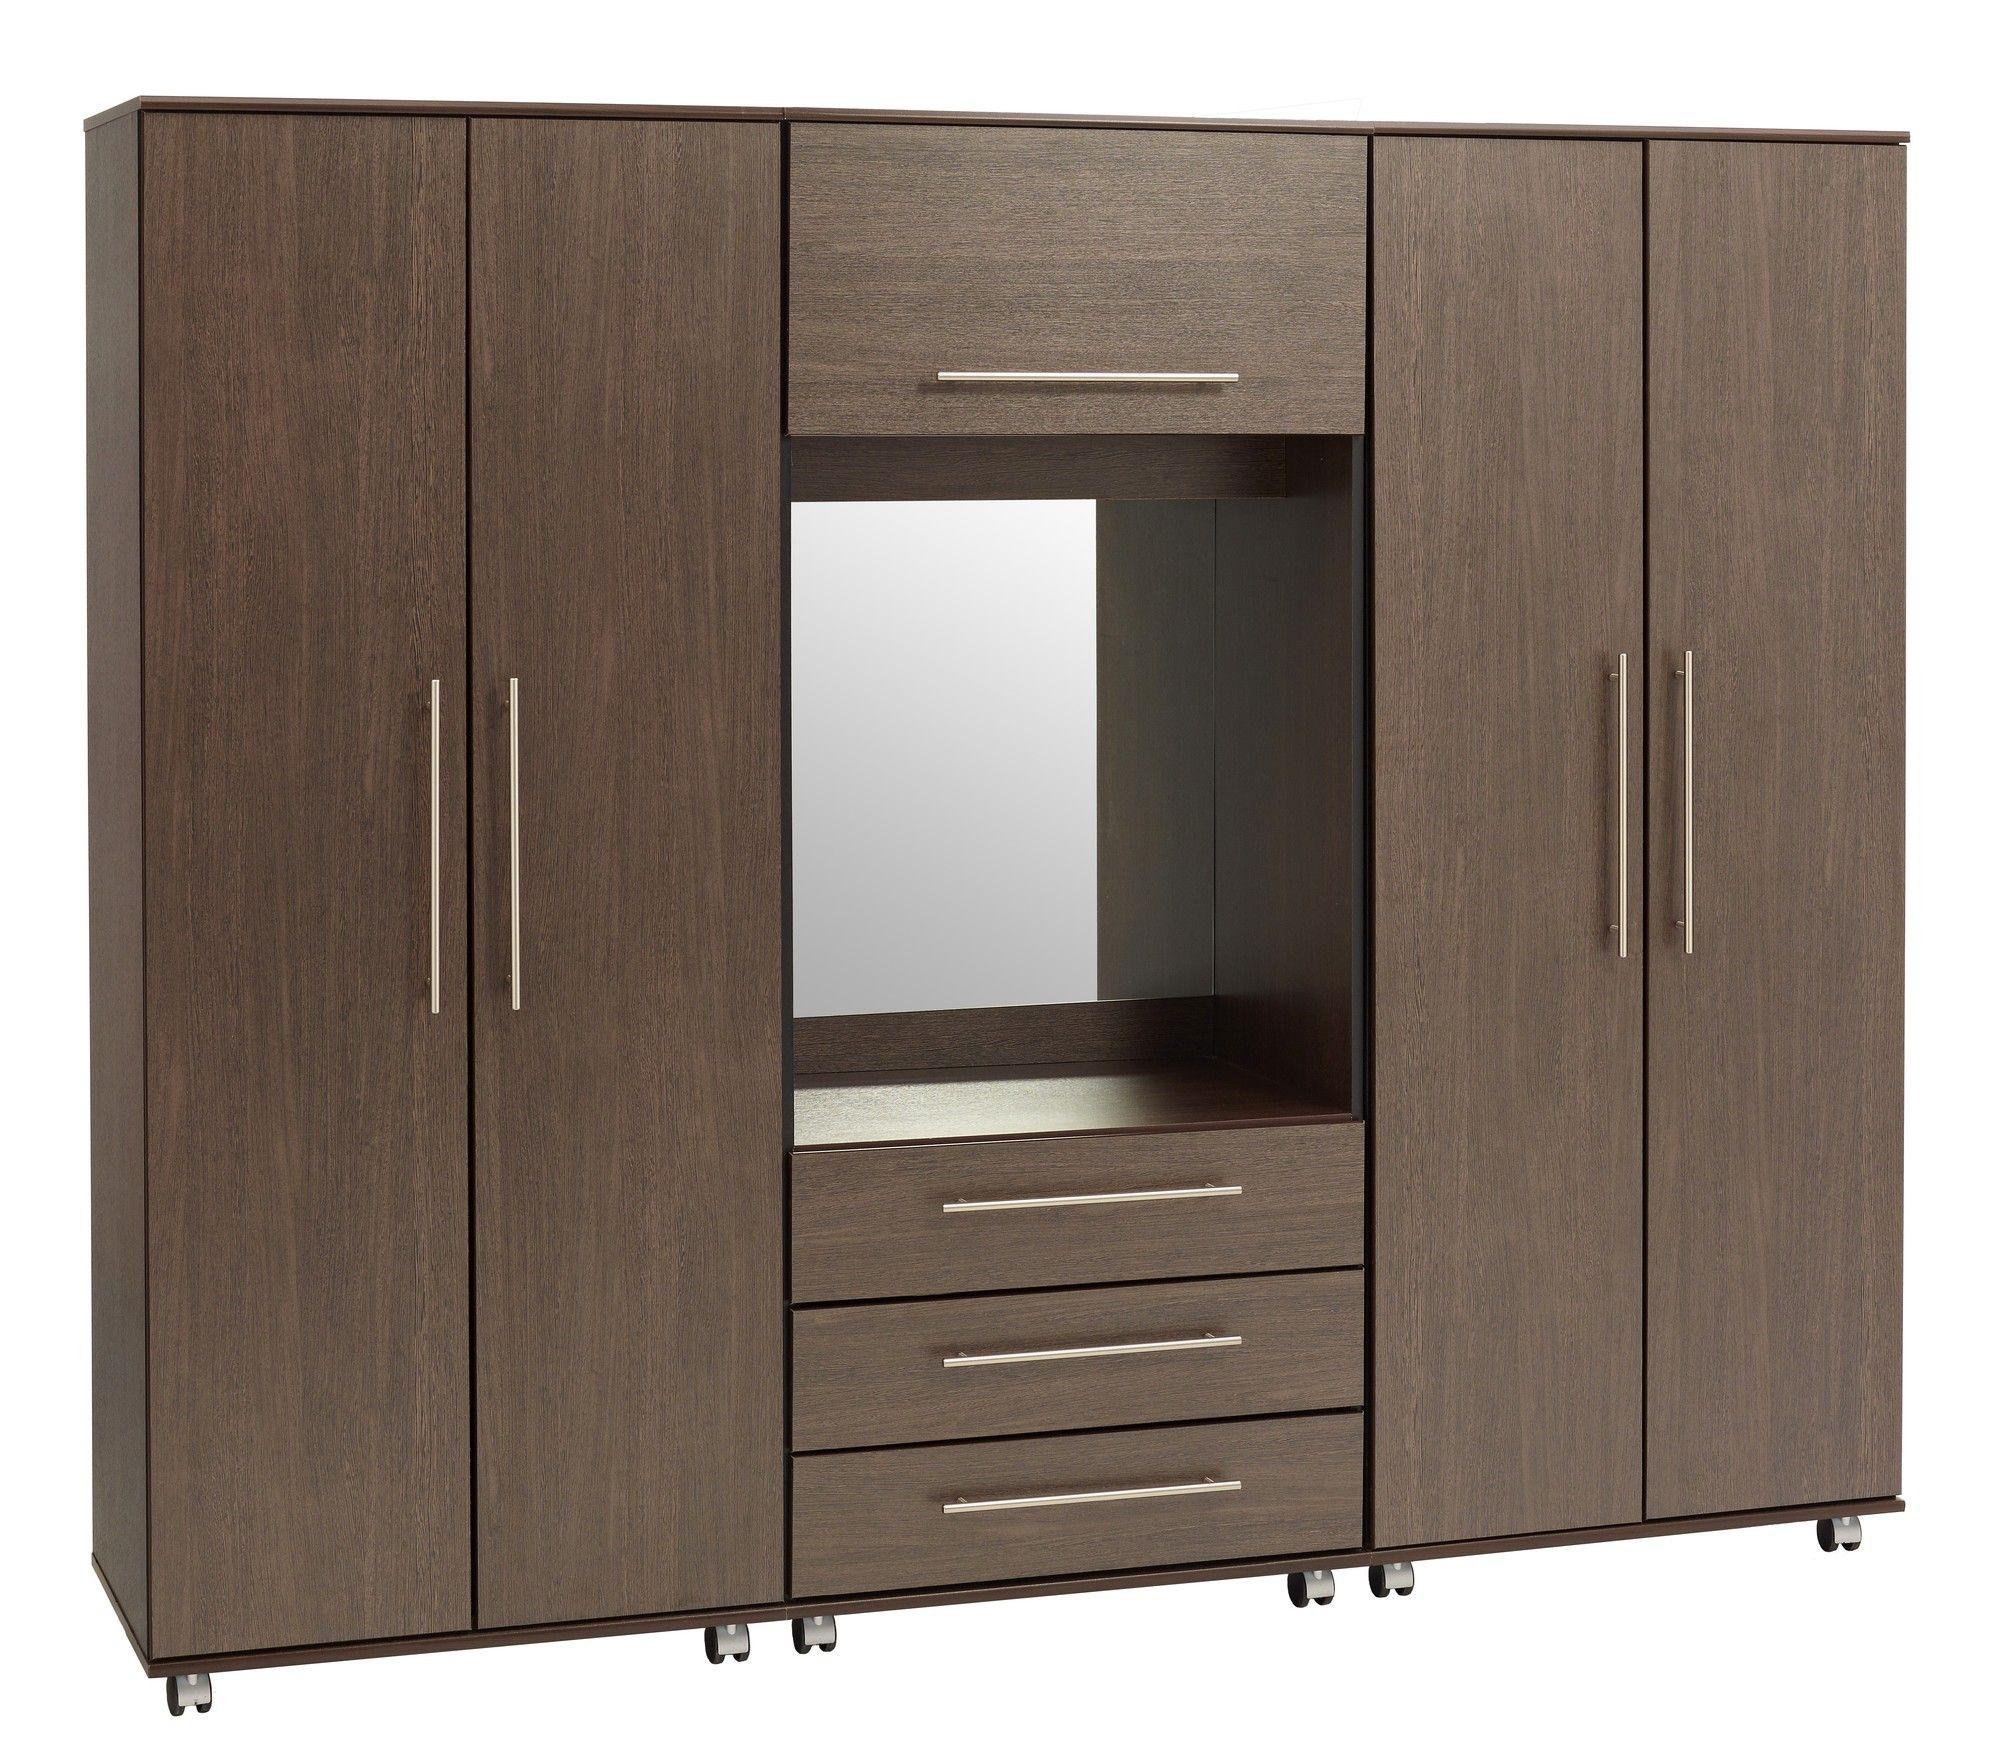 Ideal Furniture New York Fitment Wardrobe